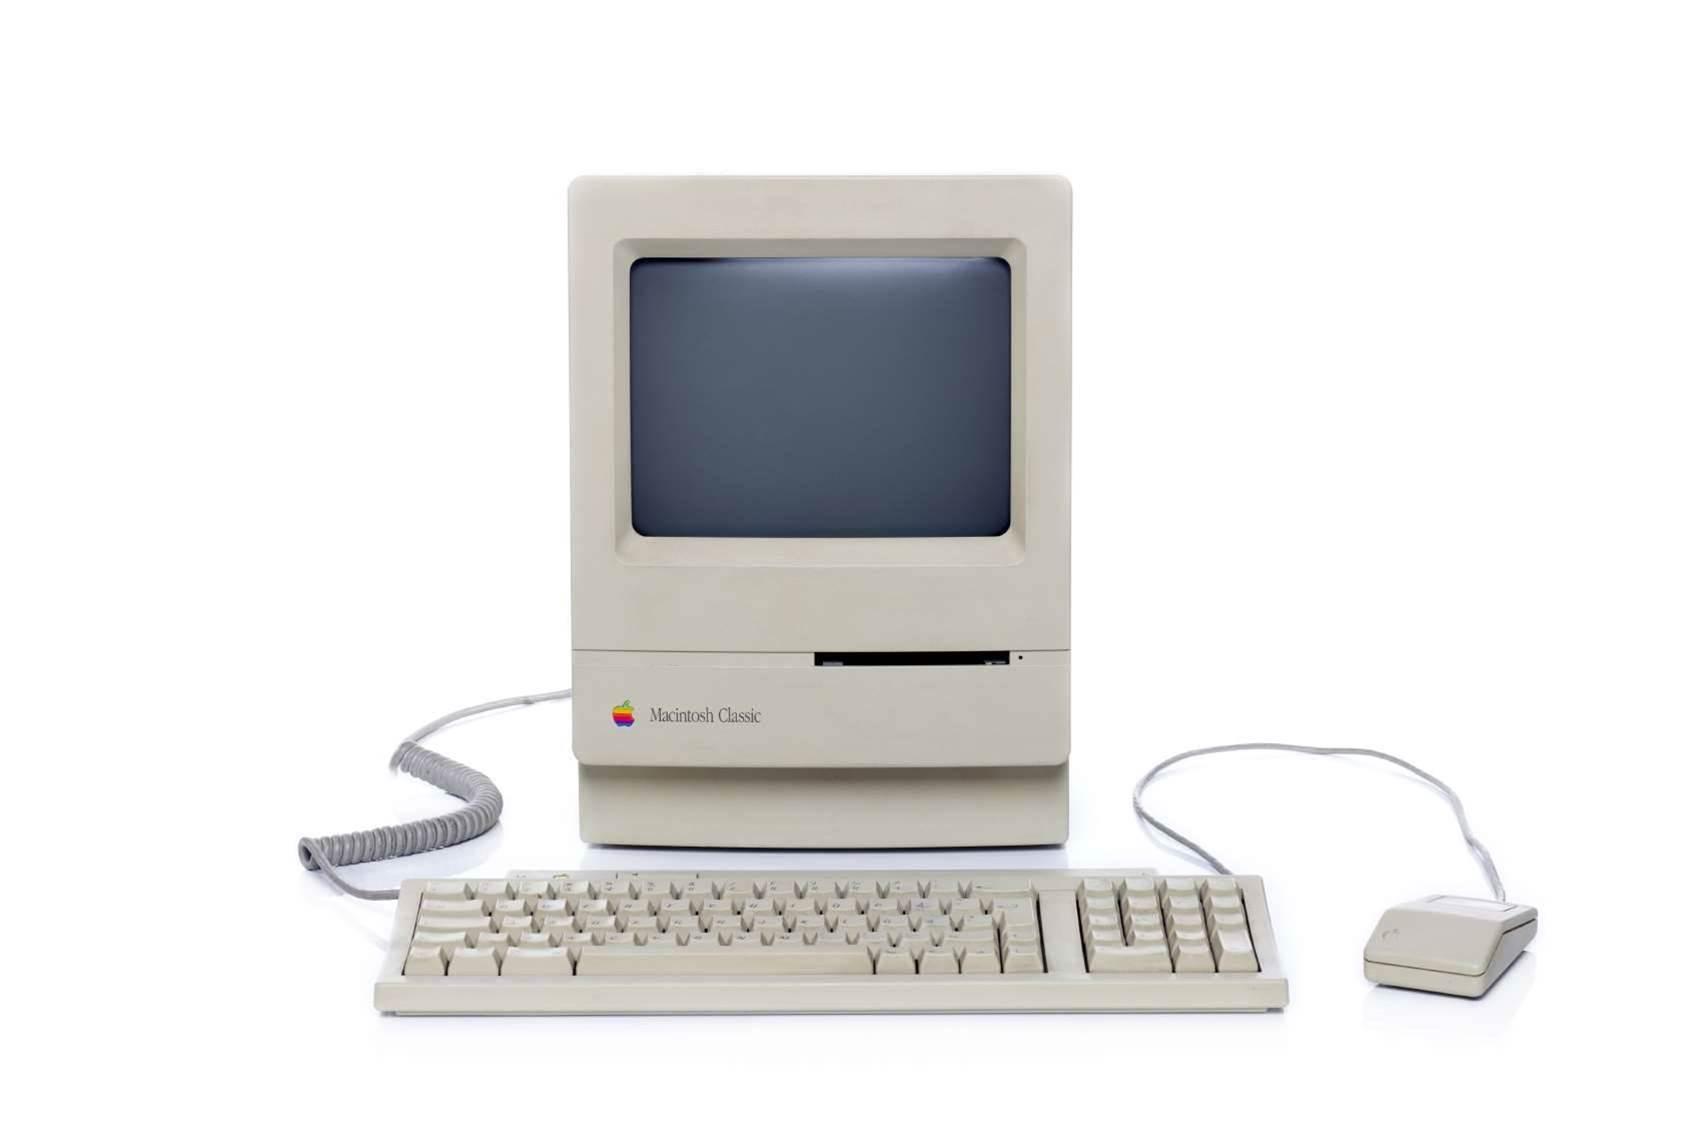 Vale OS X, arise MacOS?